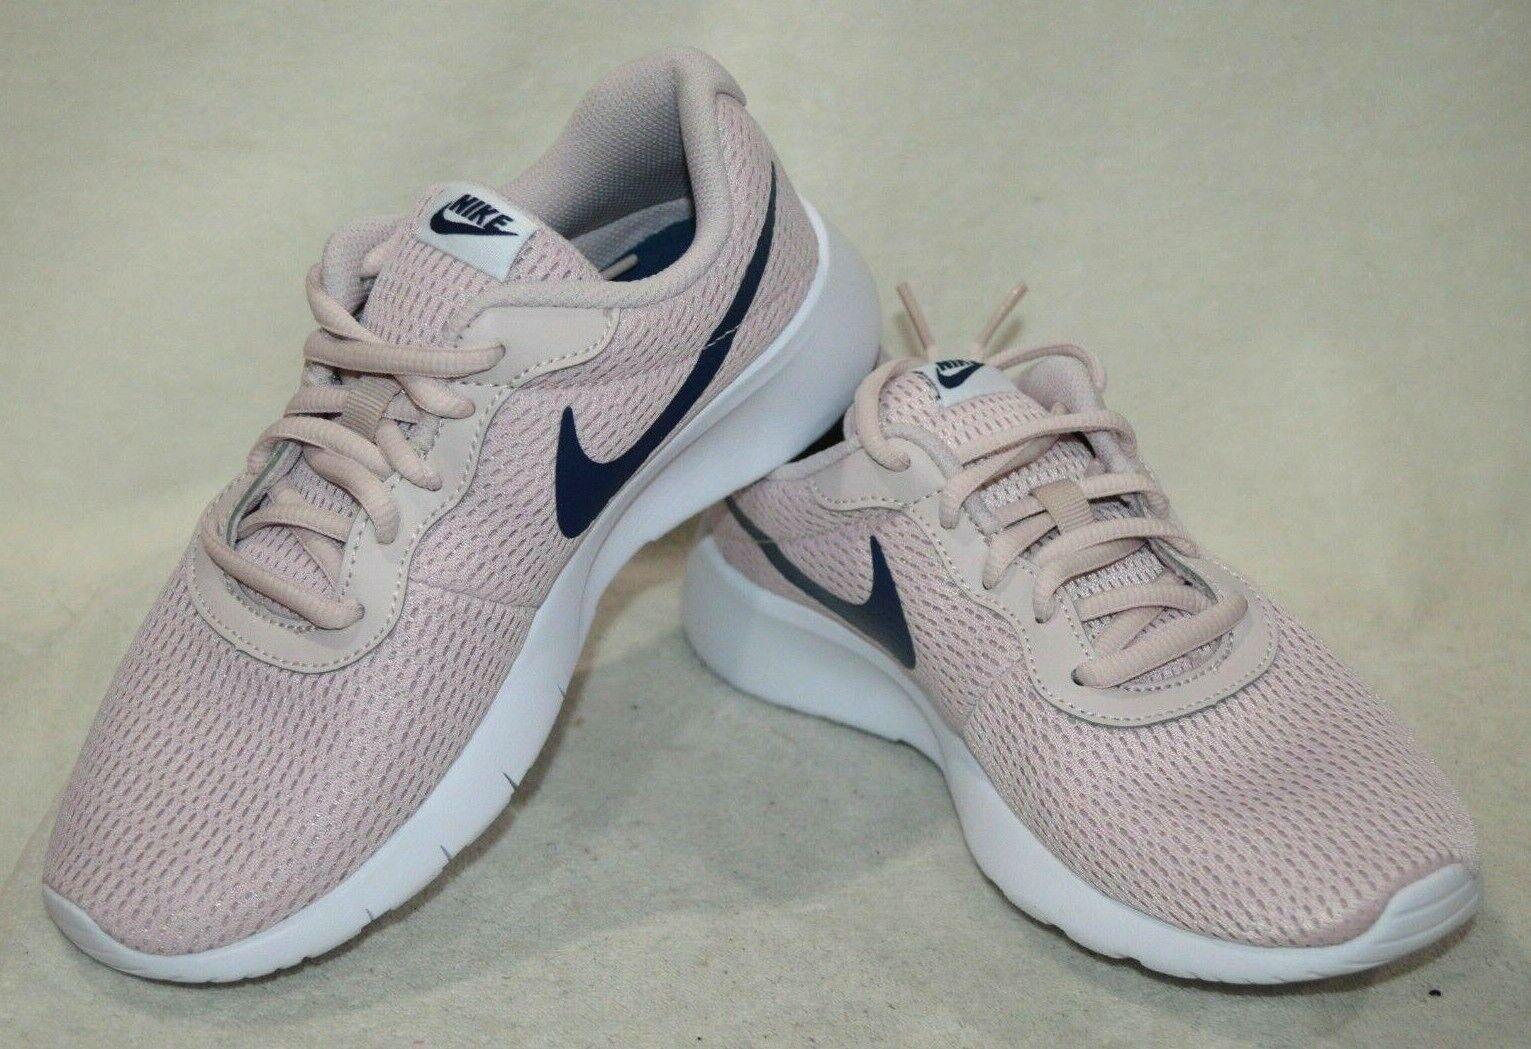 833363fbc6b9 Nike Tanjun Big Kids 818384-600 Barely Rose Pink Navy Athletic Shoes ...